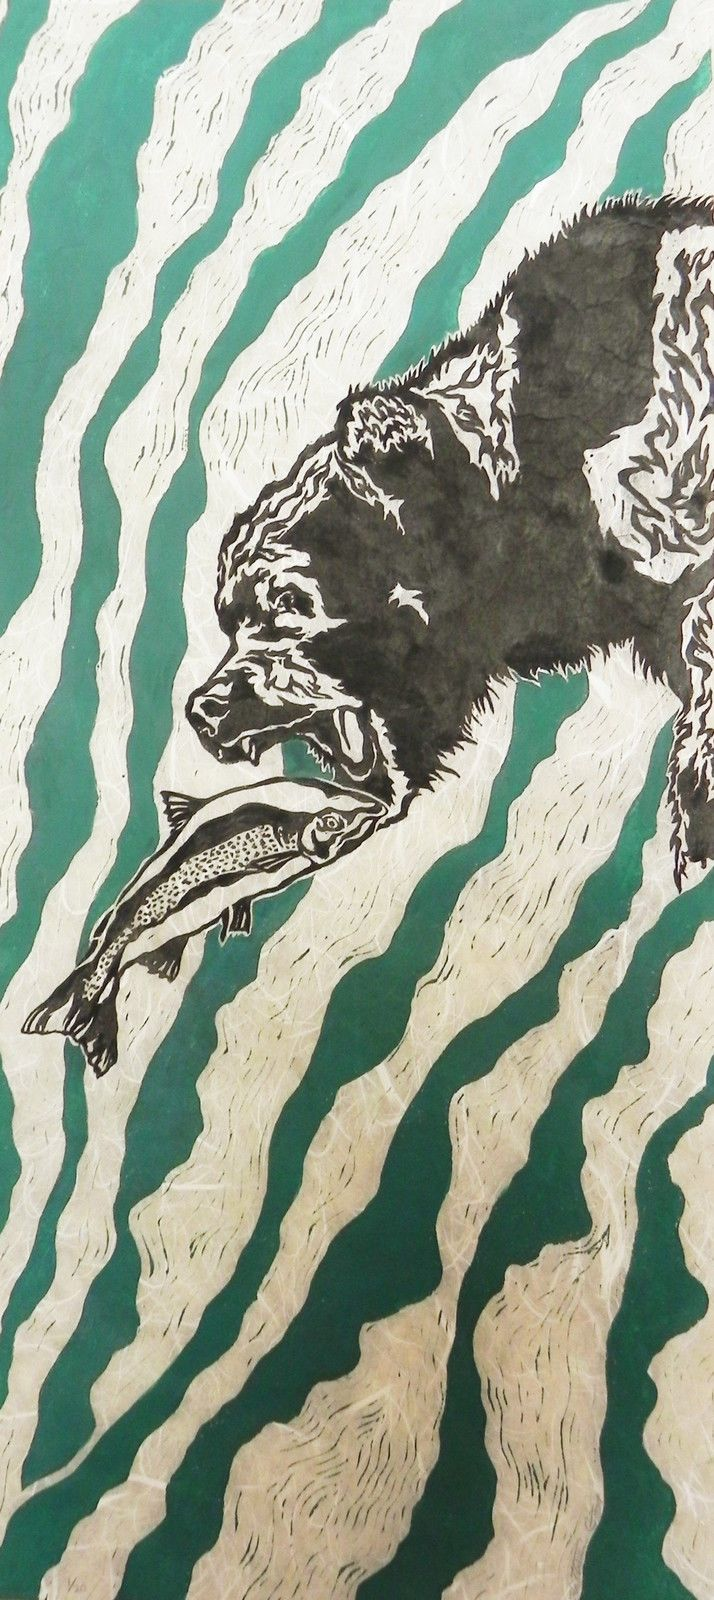 Co color art printing alaska - Grizzly Bear Alaska Salmon Fish Trout Limited Edition Block Print By K Grey